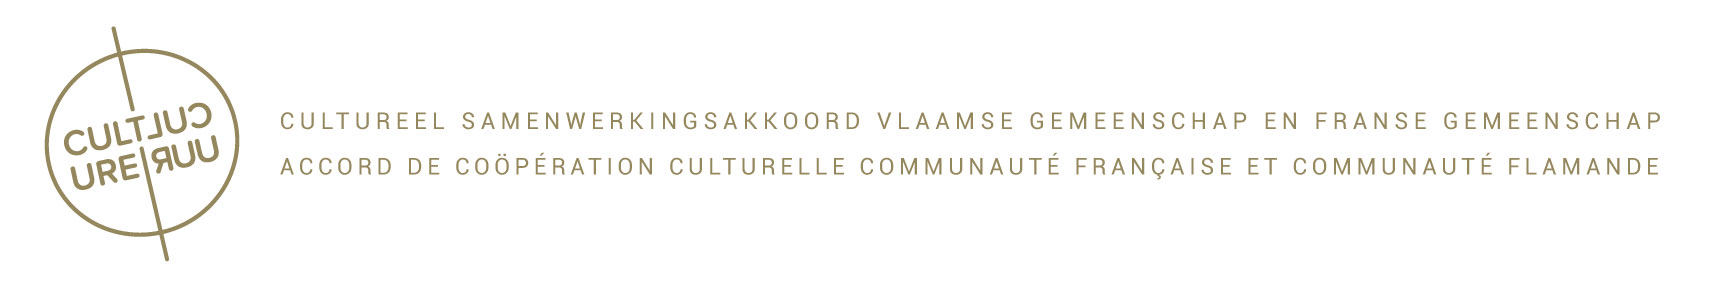 Cultureel Samenwerkingsakkoord Vlaamse Gemeenschap en Franse Gemeenschap | Accord de Coopération culturelle Communauté française et Communauté flamande